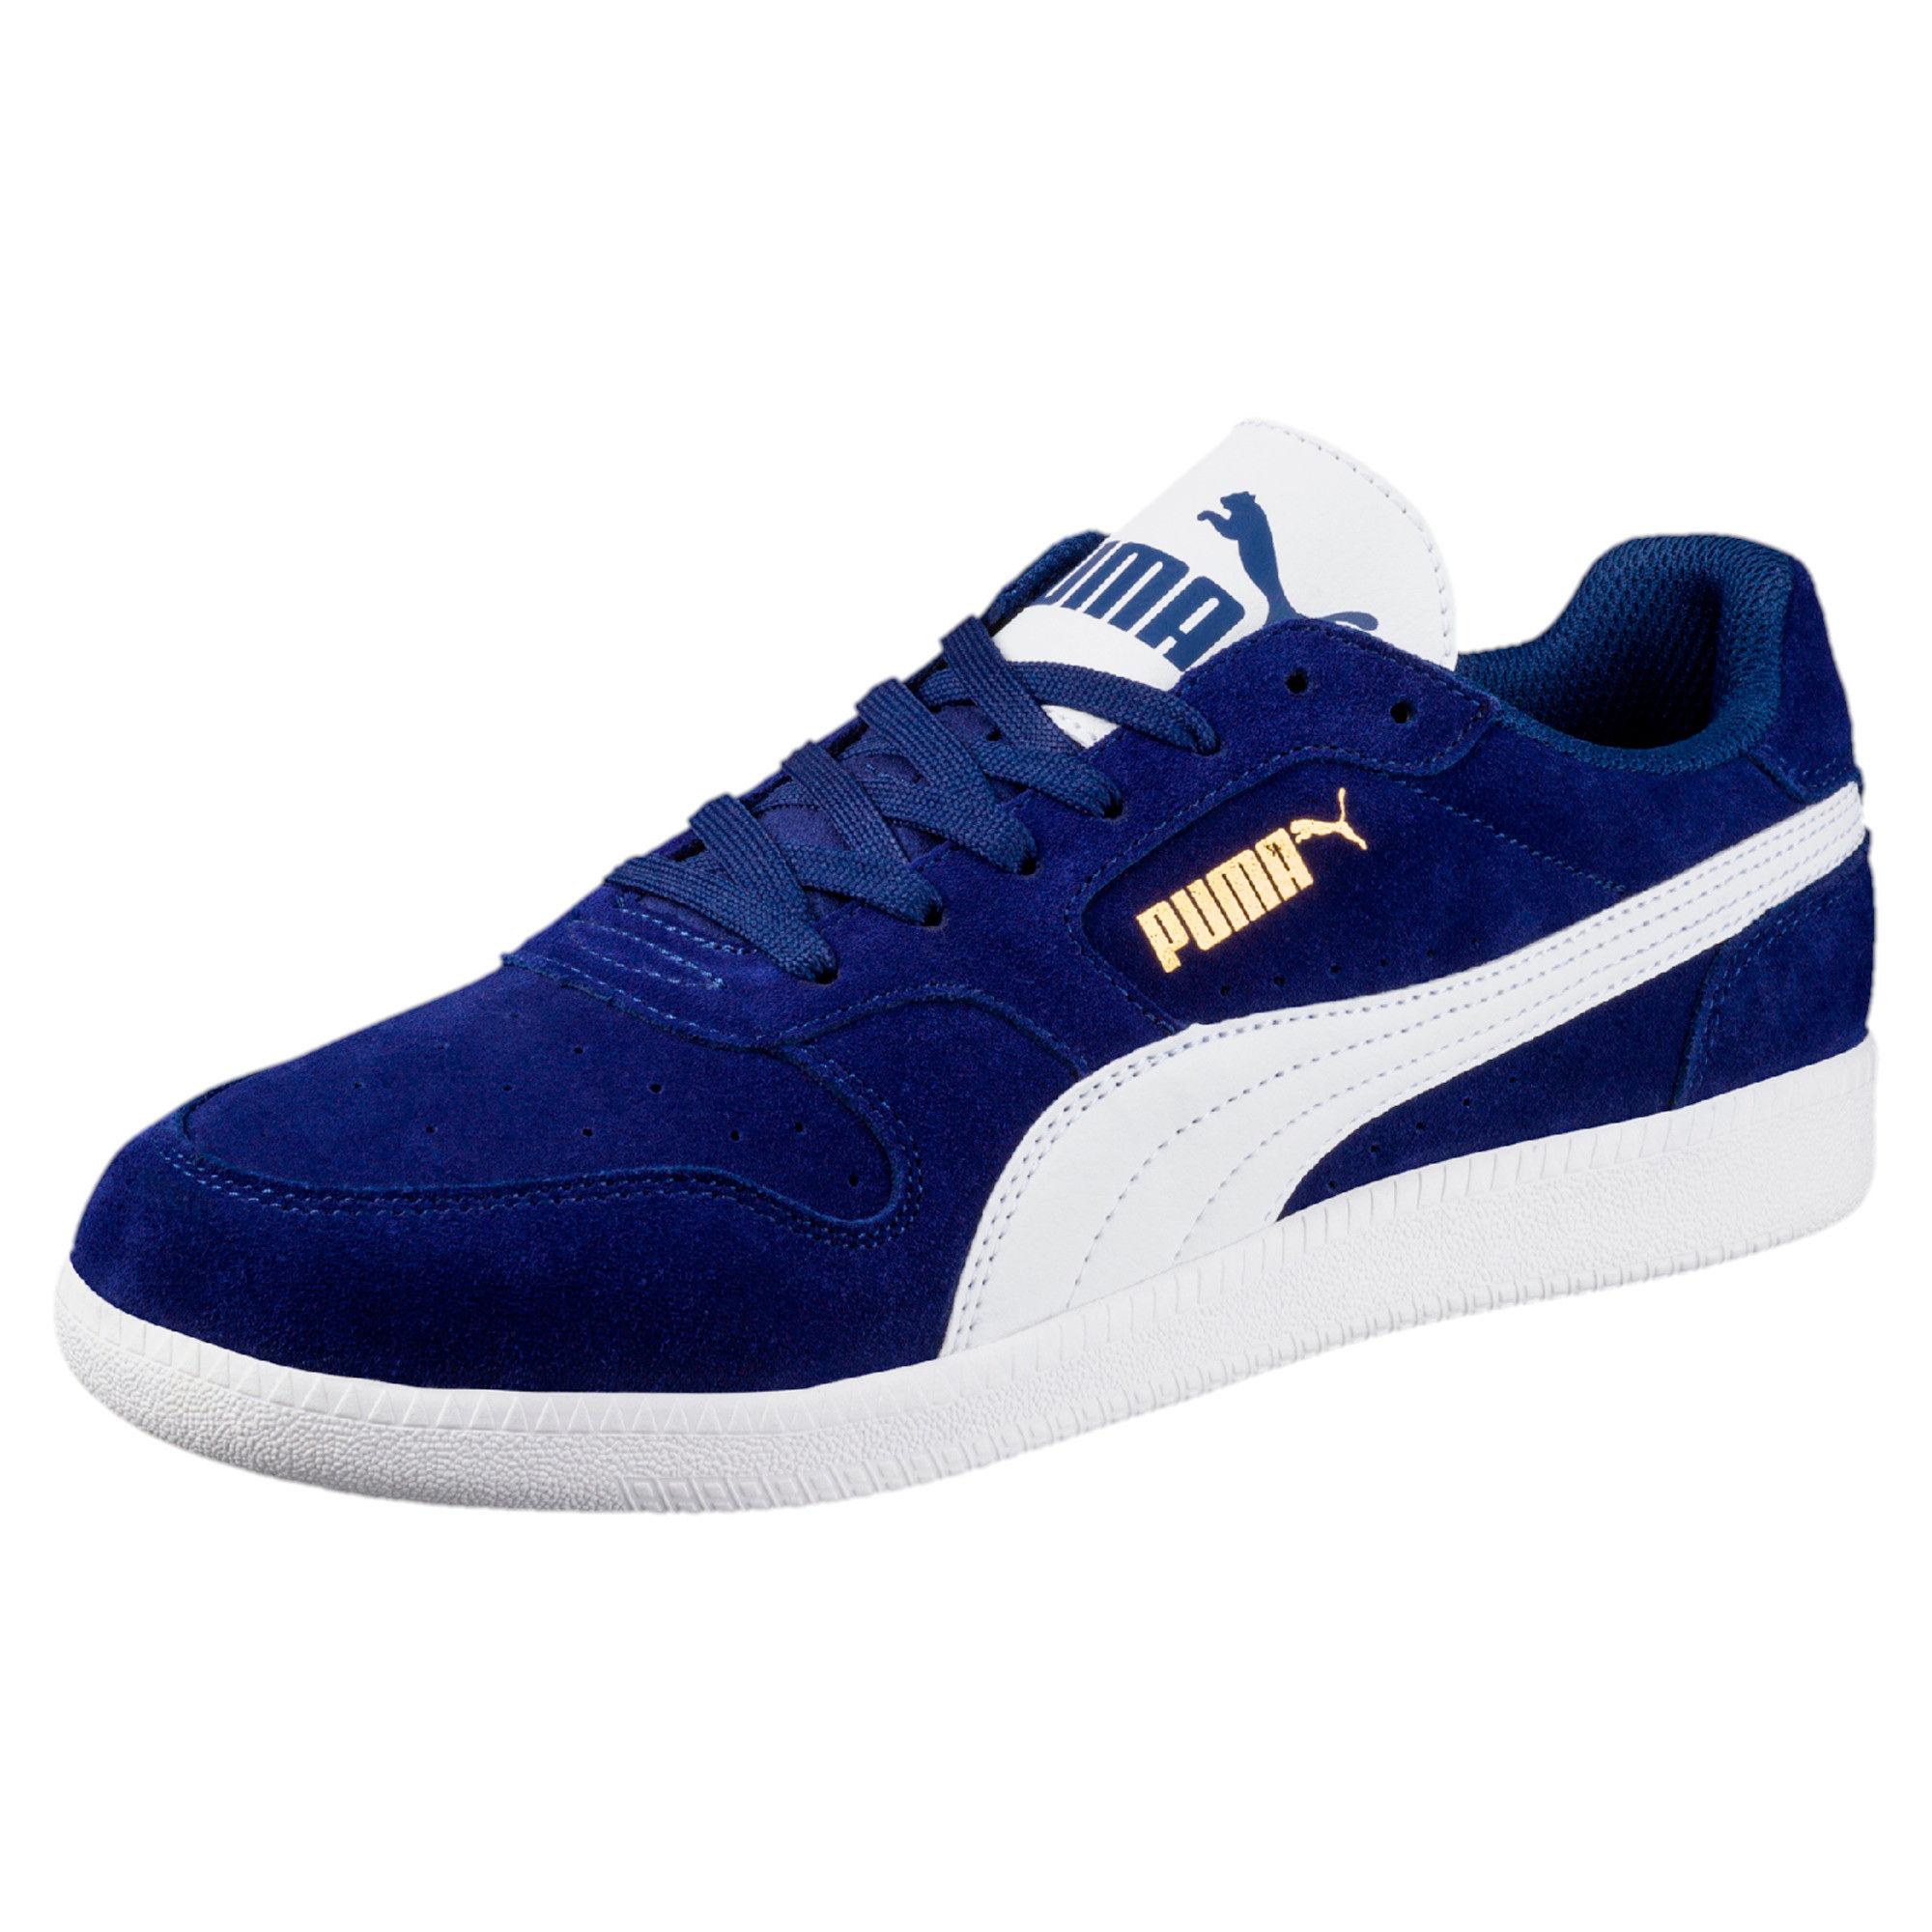 Puma Icra Trainer Sd Training Shoes